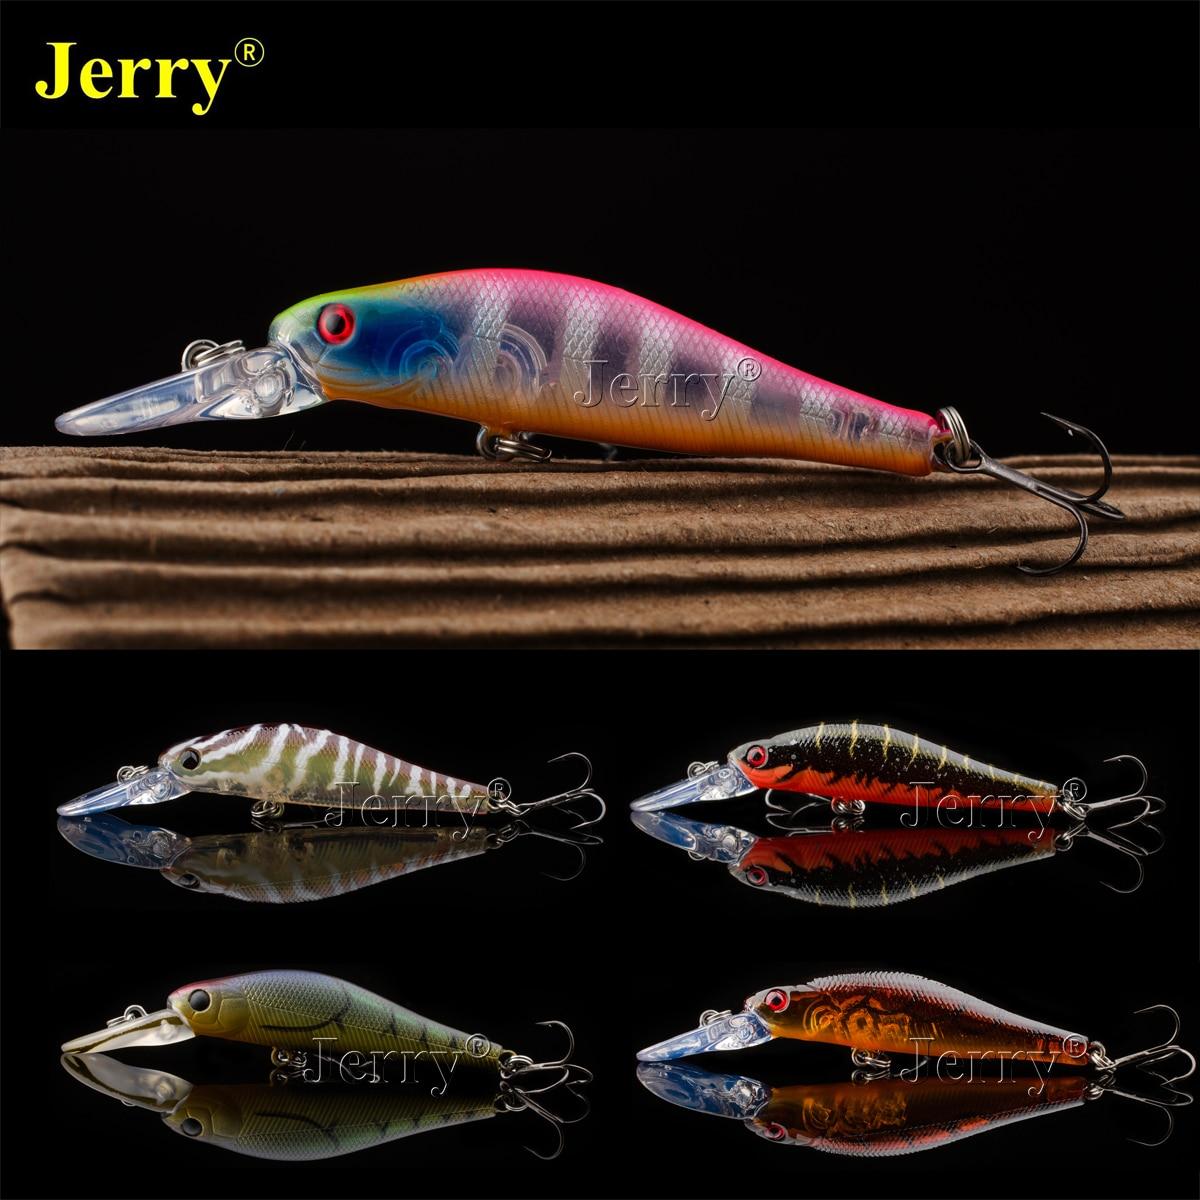 Jerry Japan minnow 5.5cm/2.17in 4g BKK hook deep medium diving jerkbait crankbait hard lure bait plug fishing crank bait